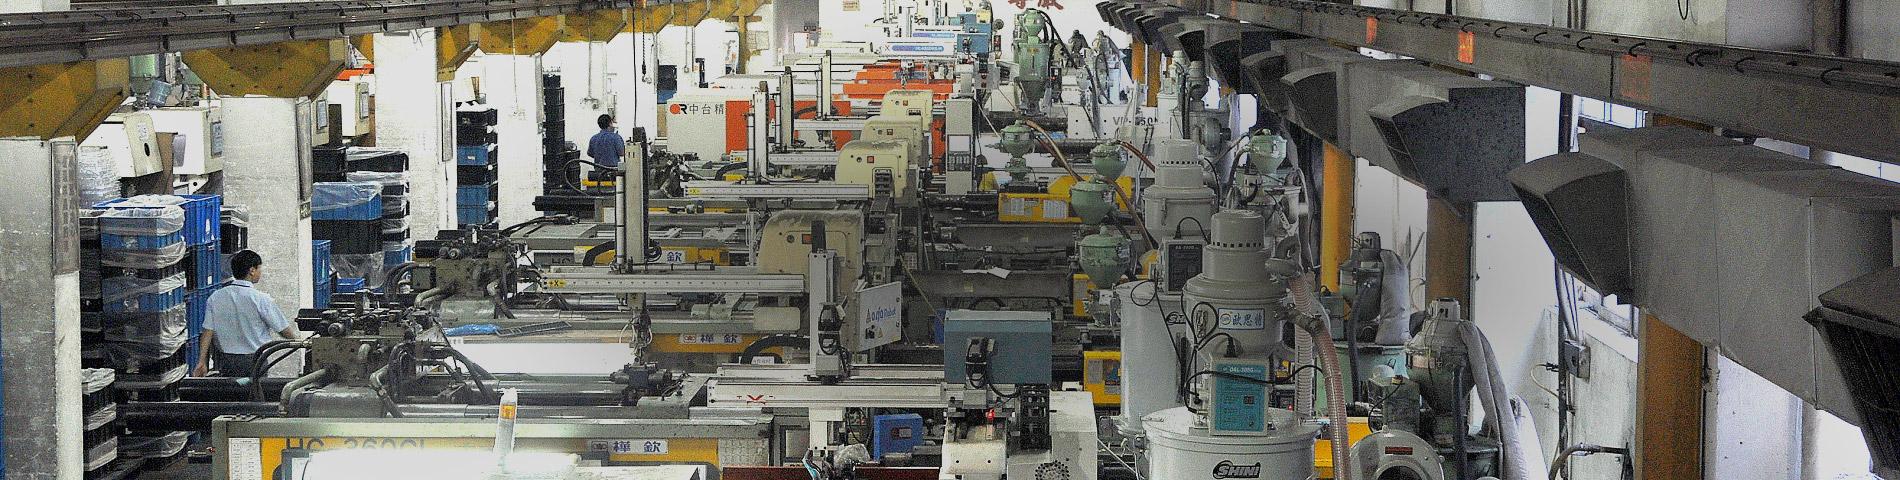 TERA มีประสบการณ์ในการผลิต    ผลิตภัณฑ์พลาสติกและซิลิคอน    เป็นเวลา 27 ปี